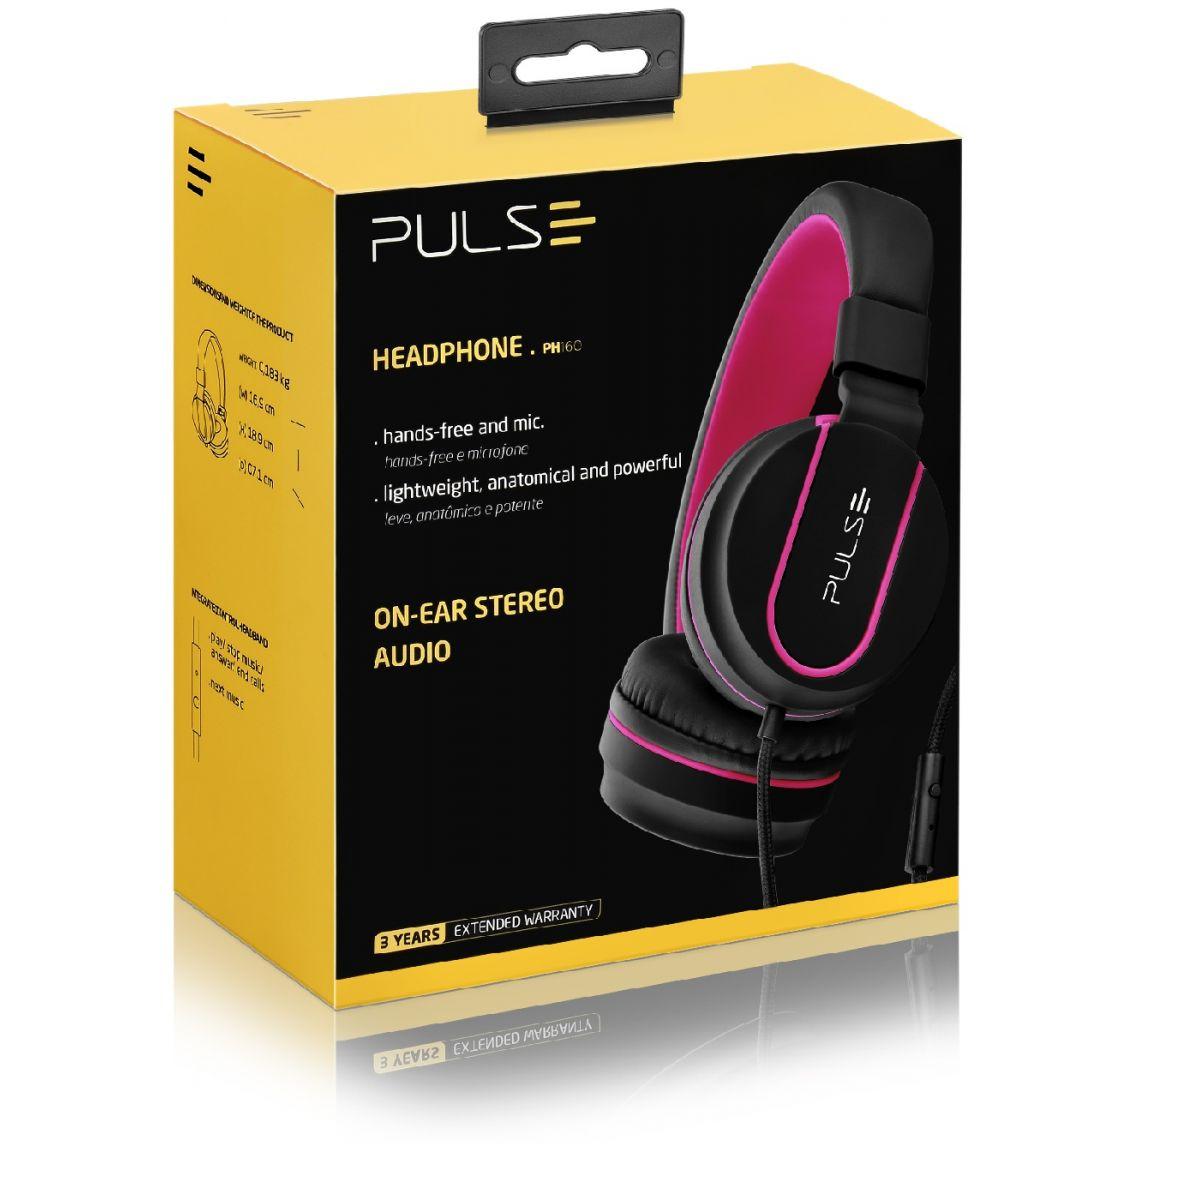 Fone Headphone Pulse Preto com Rosa PH160 Multilaser